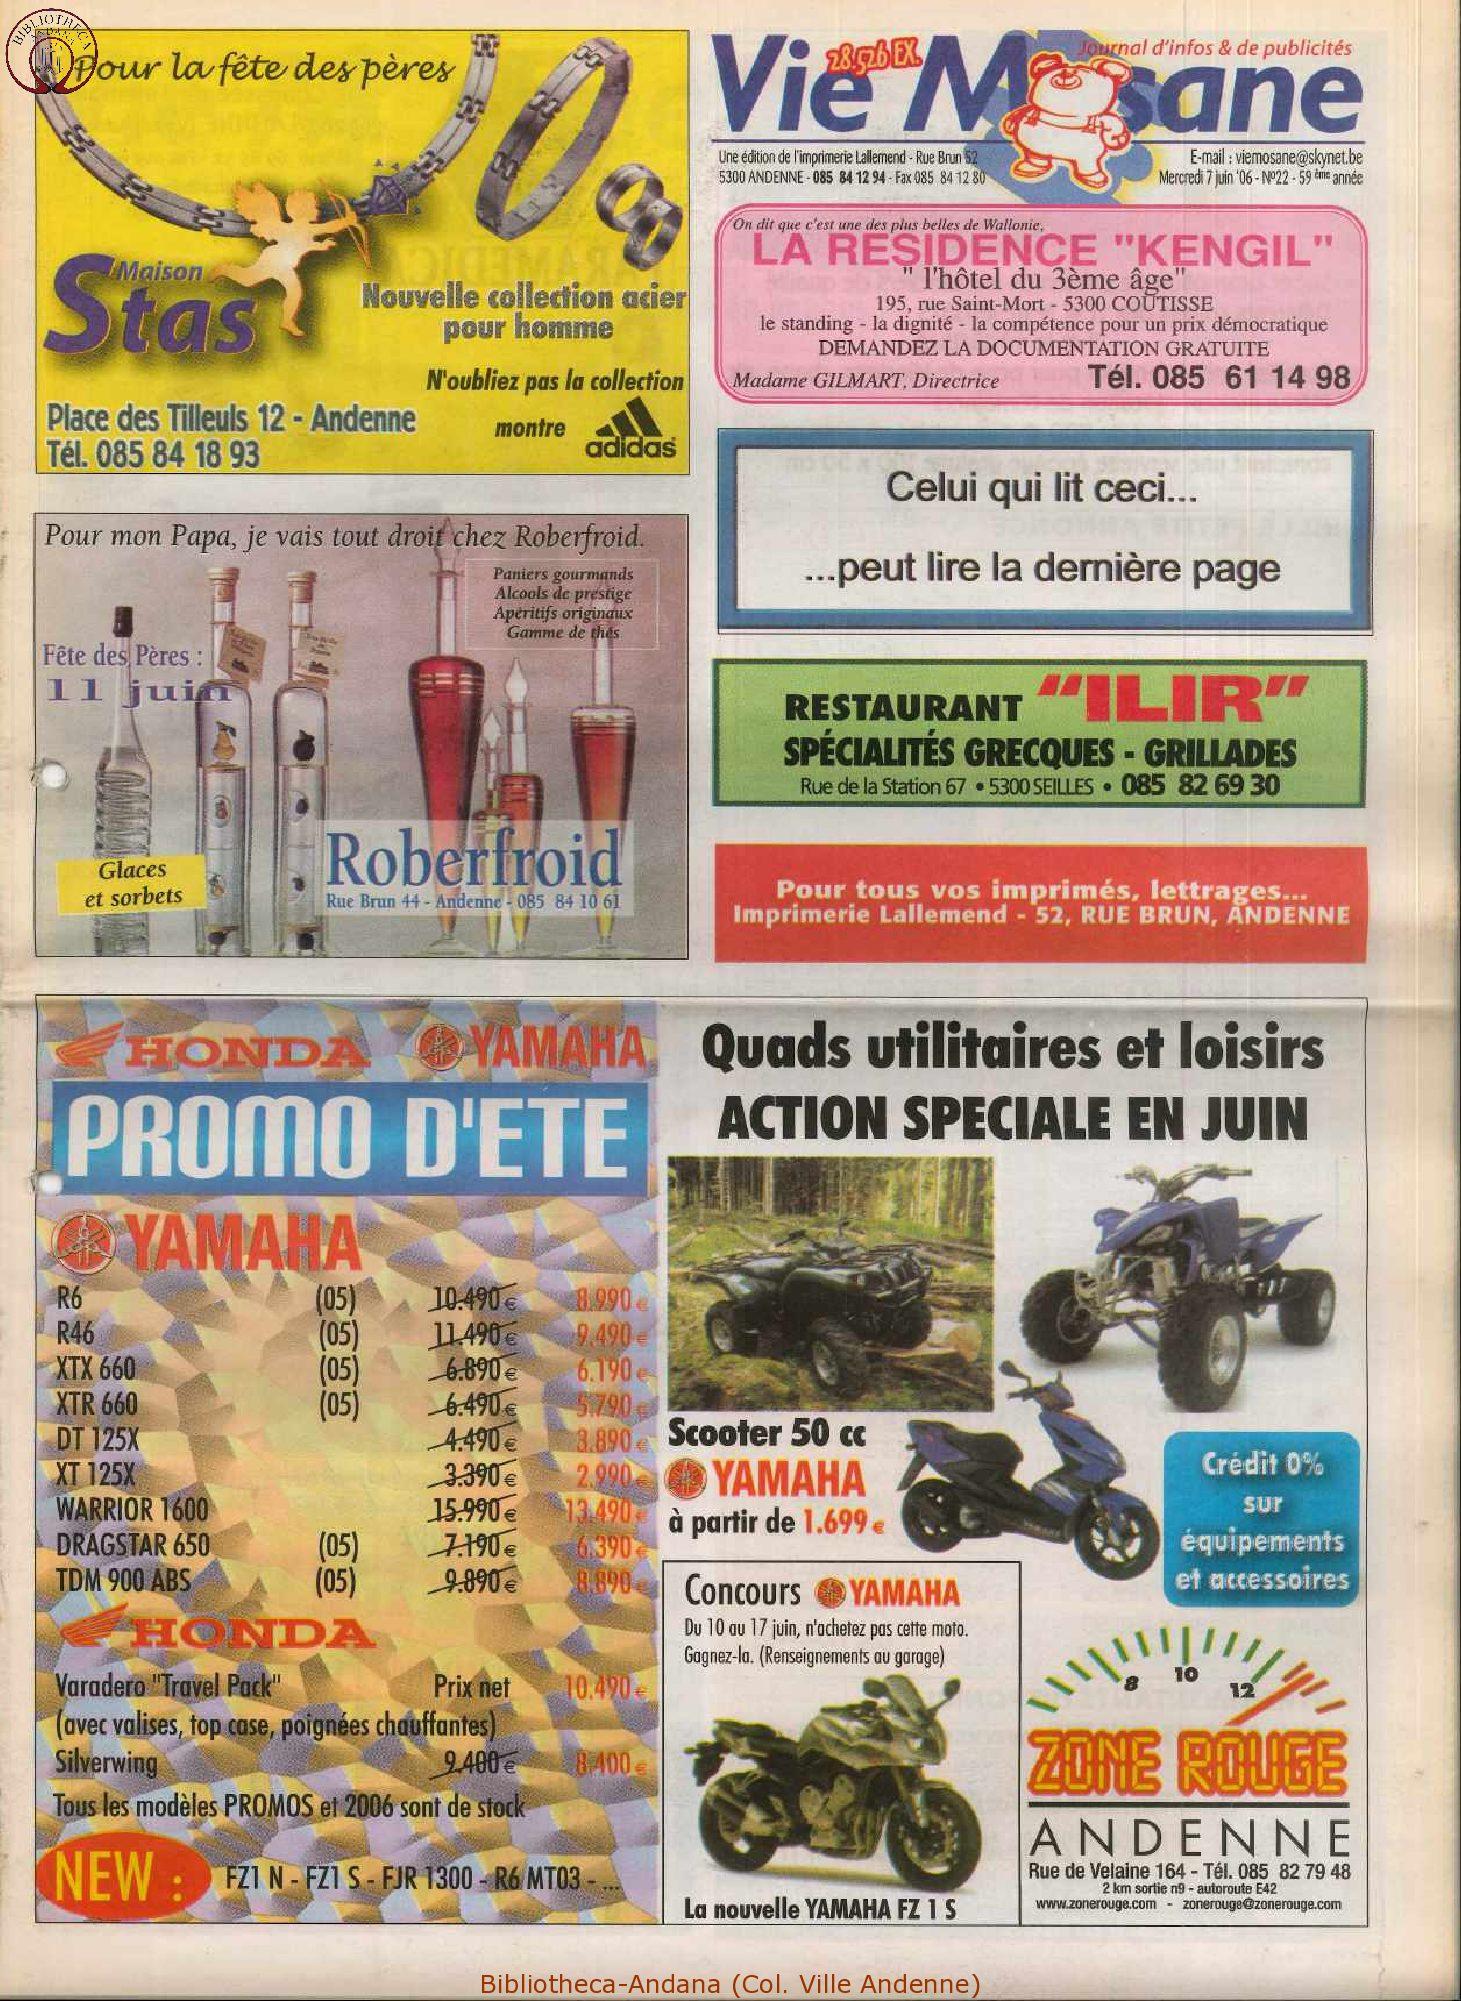 59e année - n°22 - 7 juin 2006